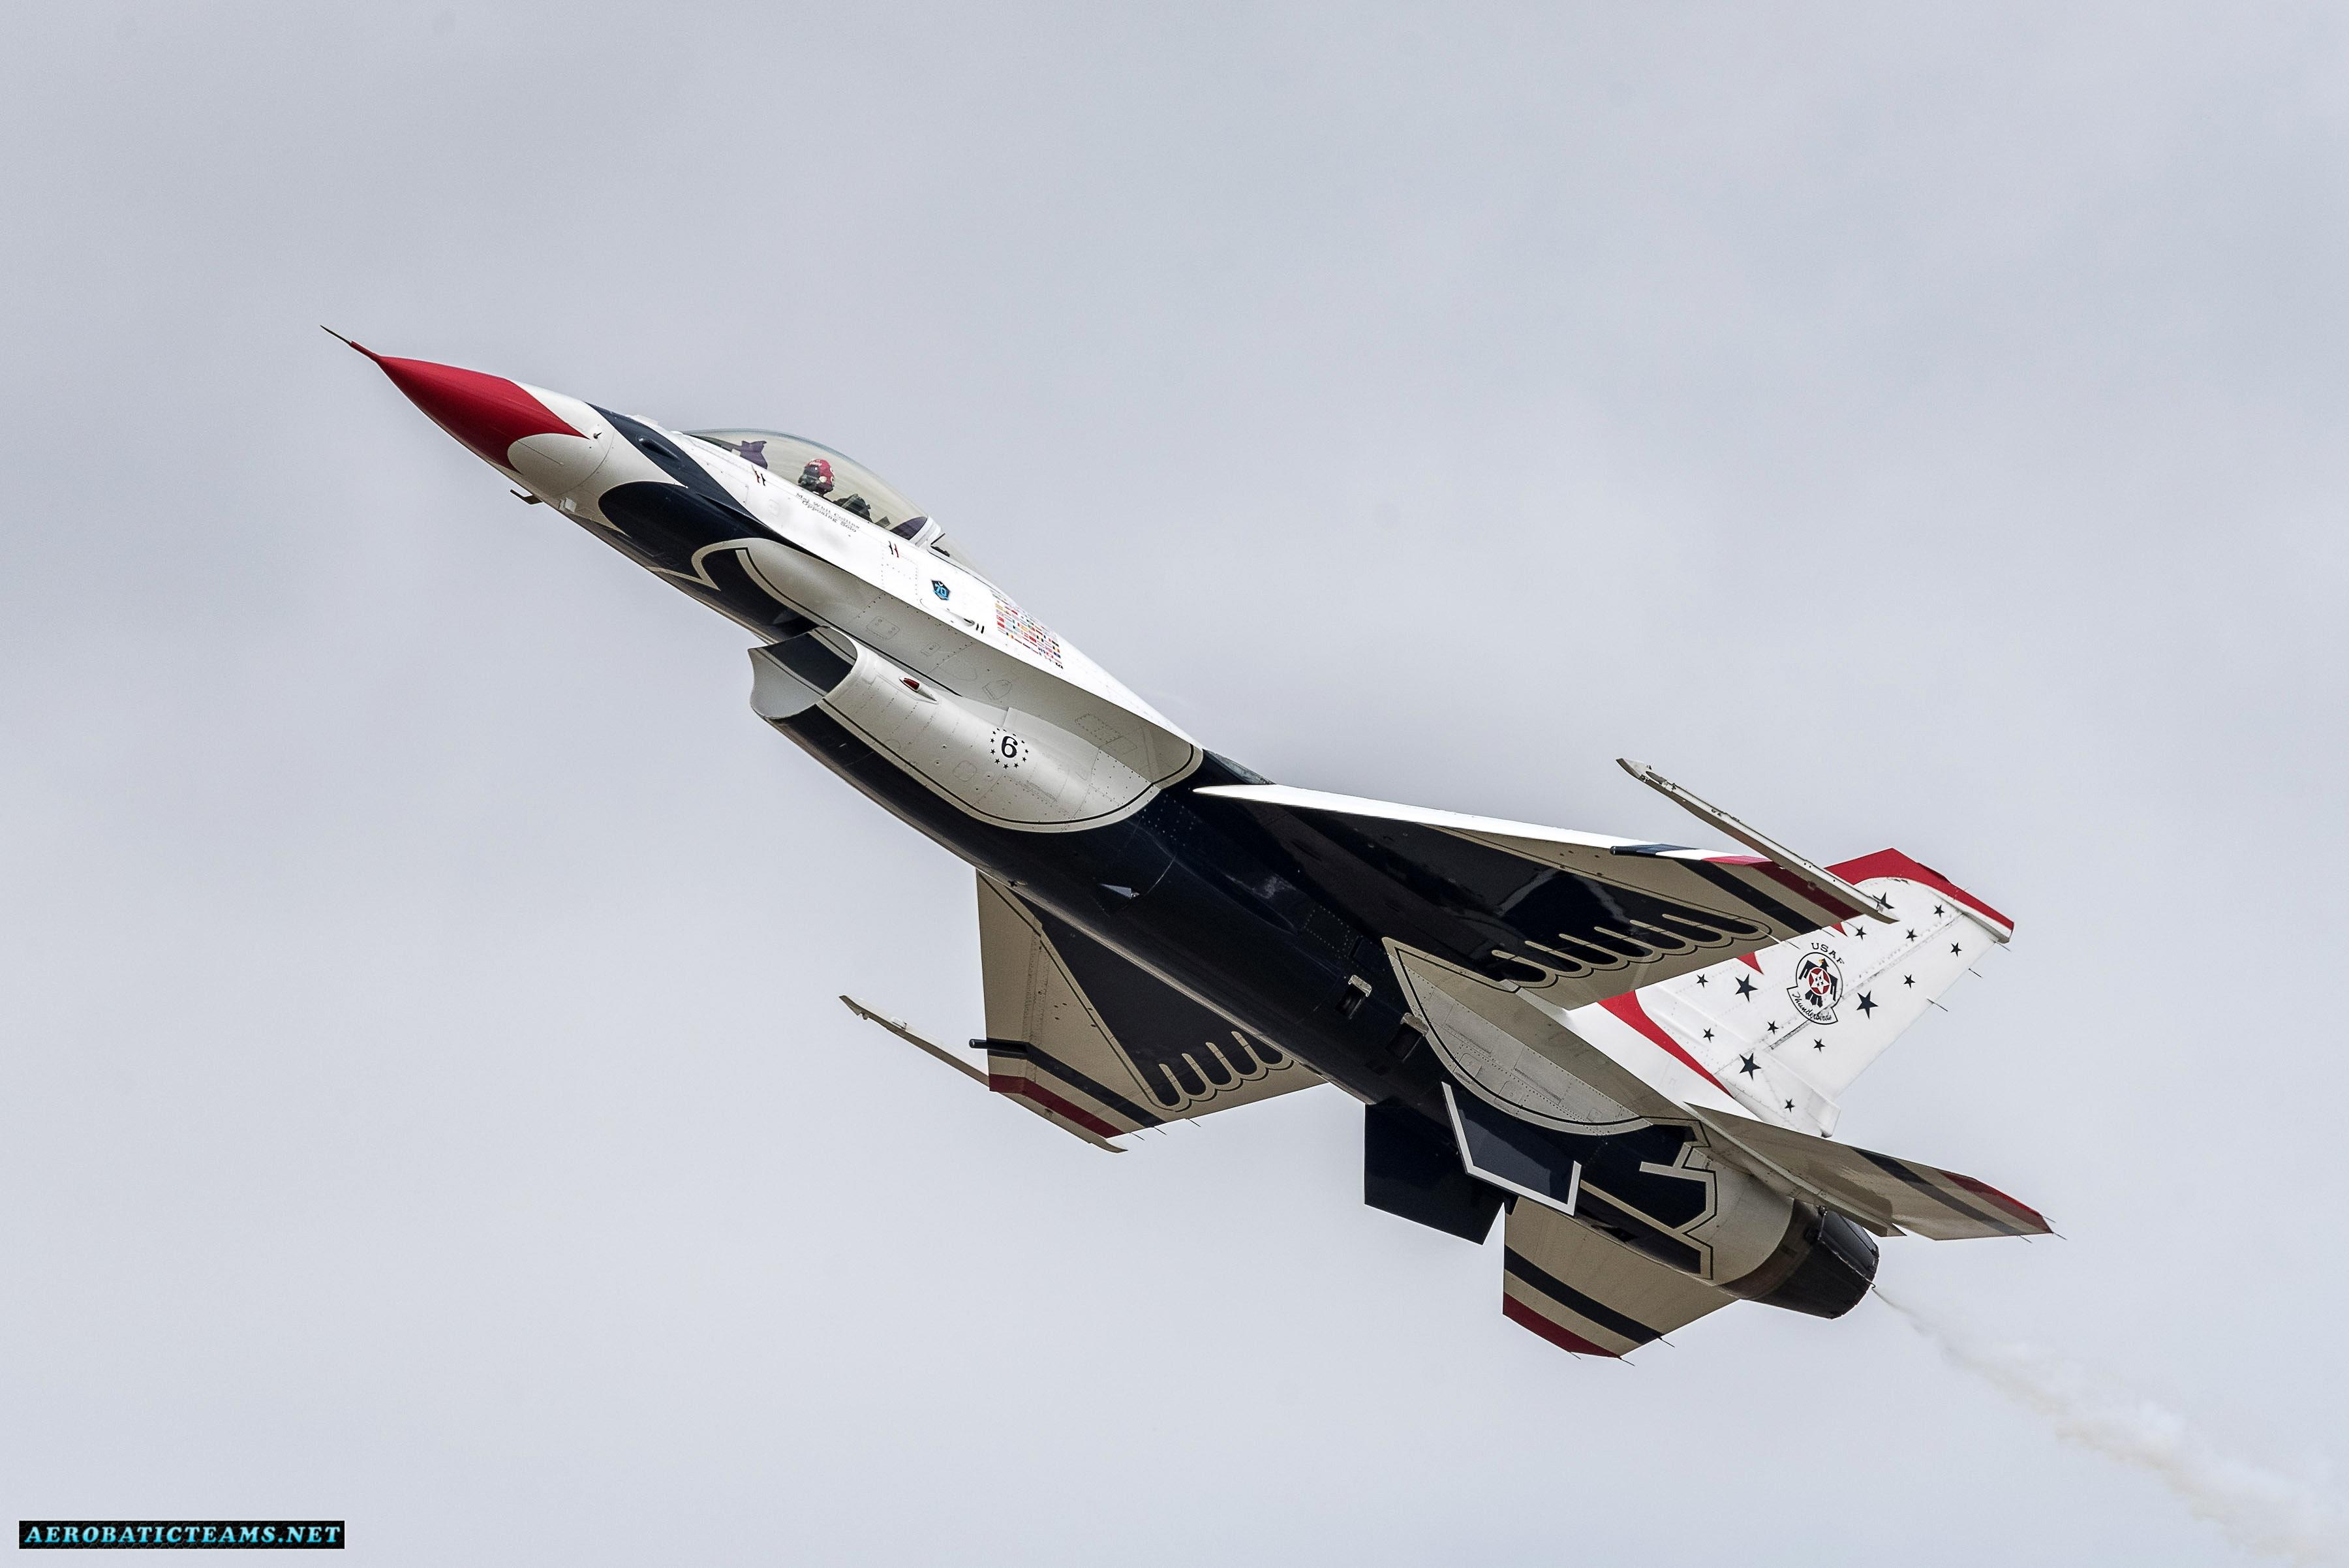 Thunderbirds resume practice flights after the fatal crash